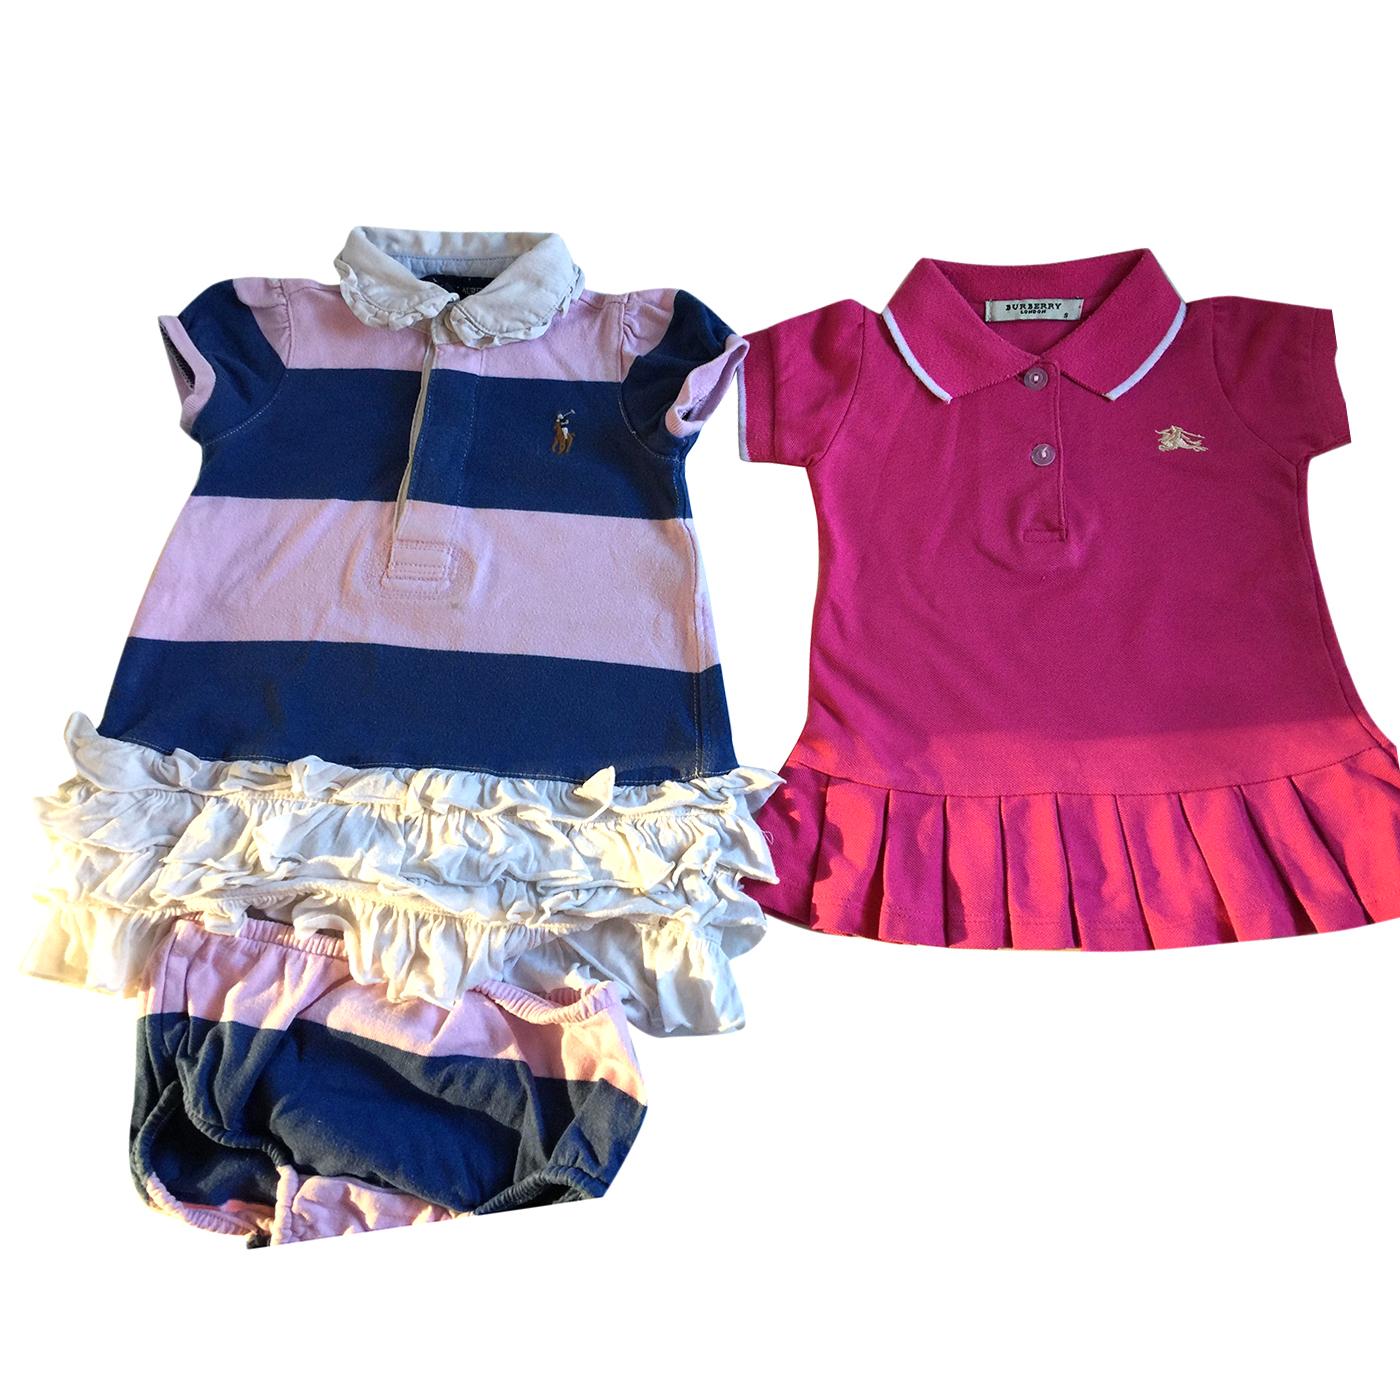 4b57767a9 Burberry And Ralph Lauren Girls Dresses   HEWI London